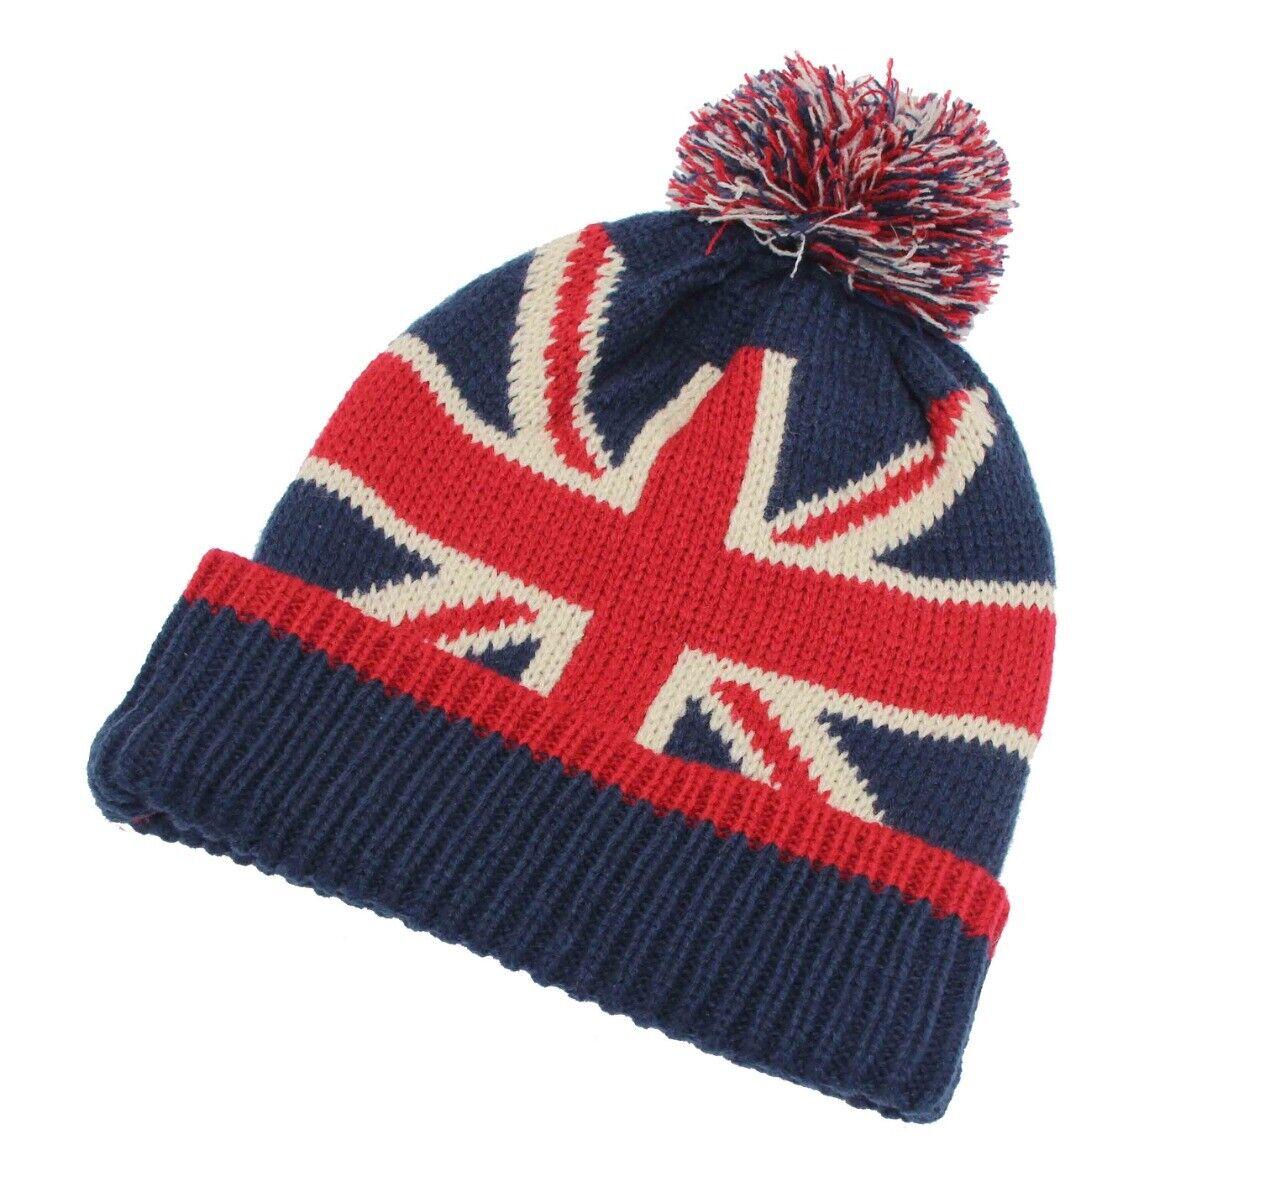 Women/'s Men/'s Beanie Hats British Flag Union Jack Pom Pom Knitted Hats